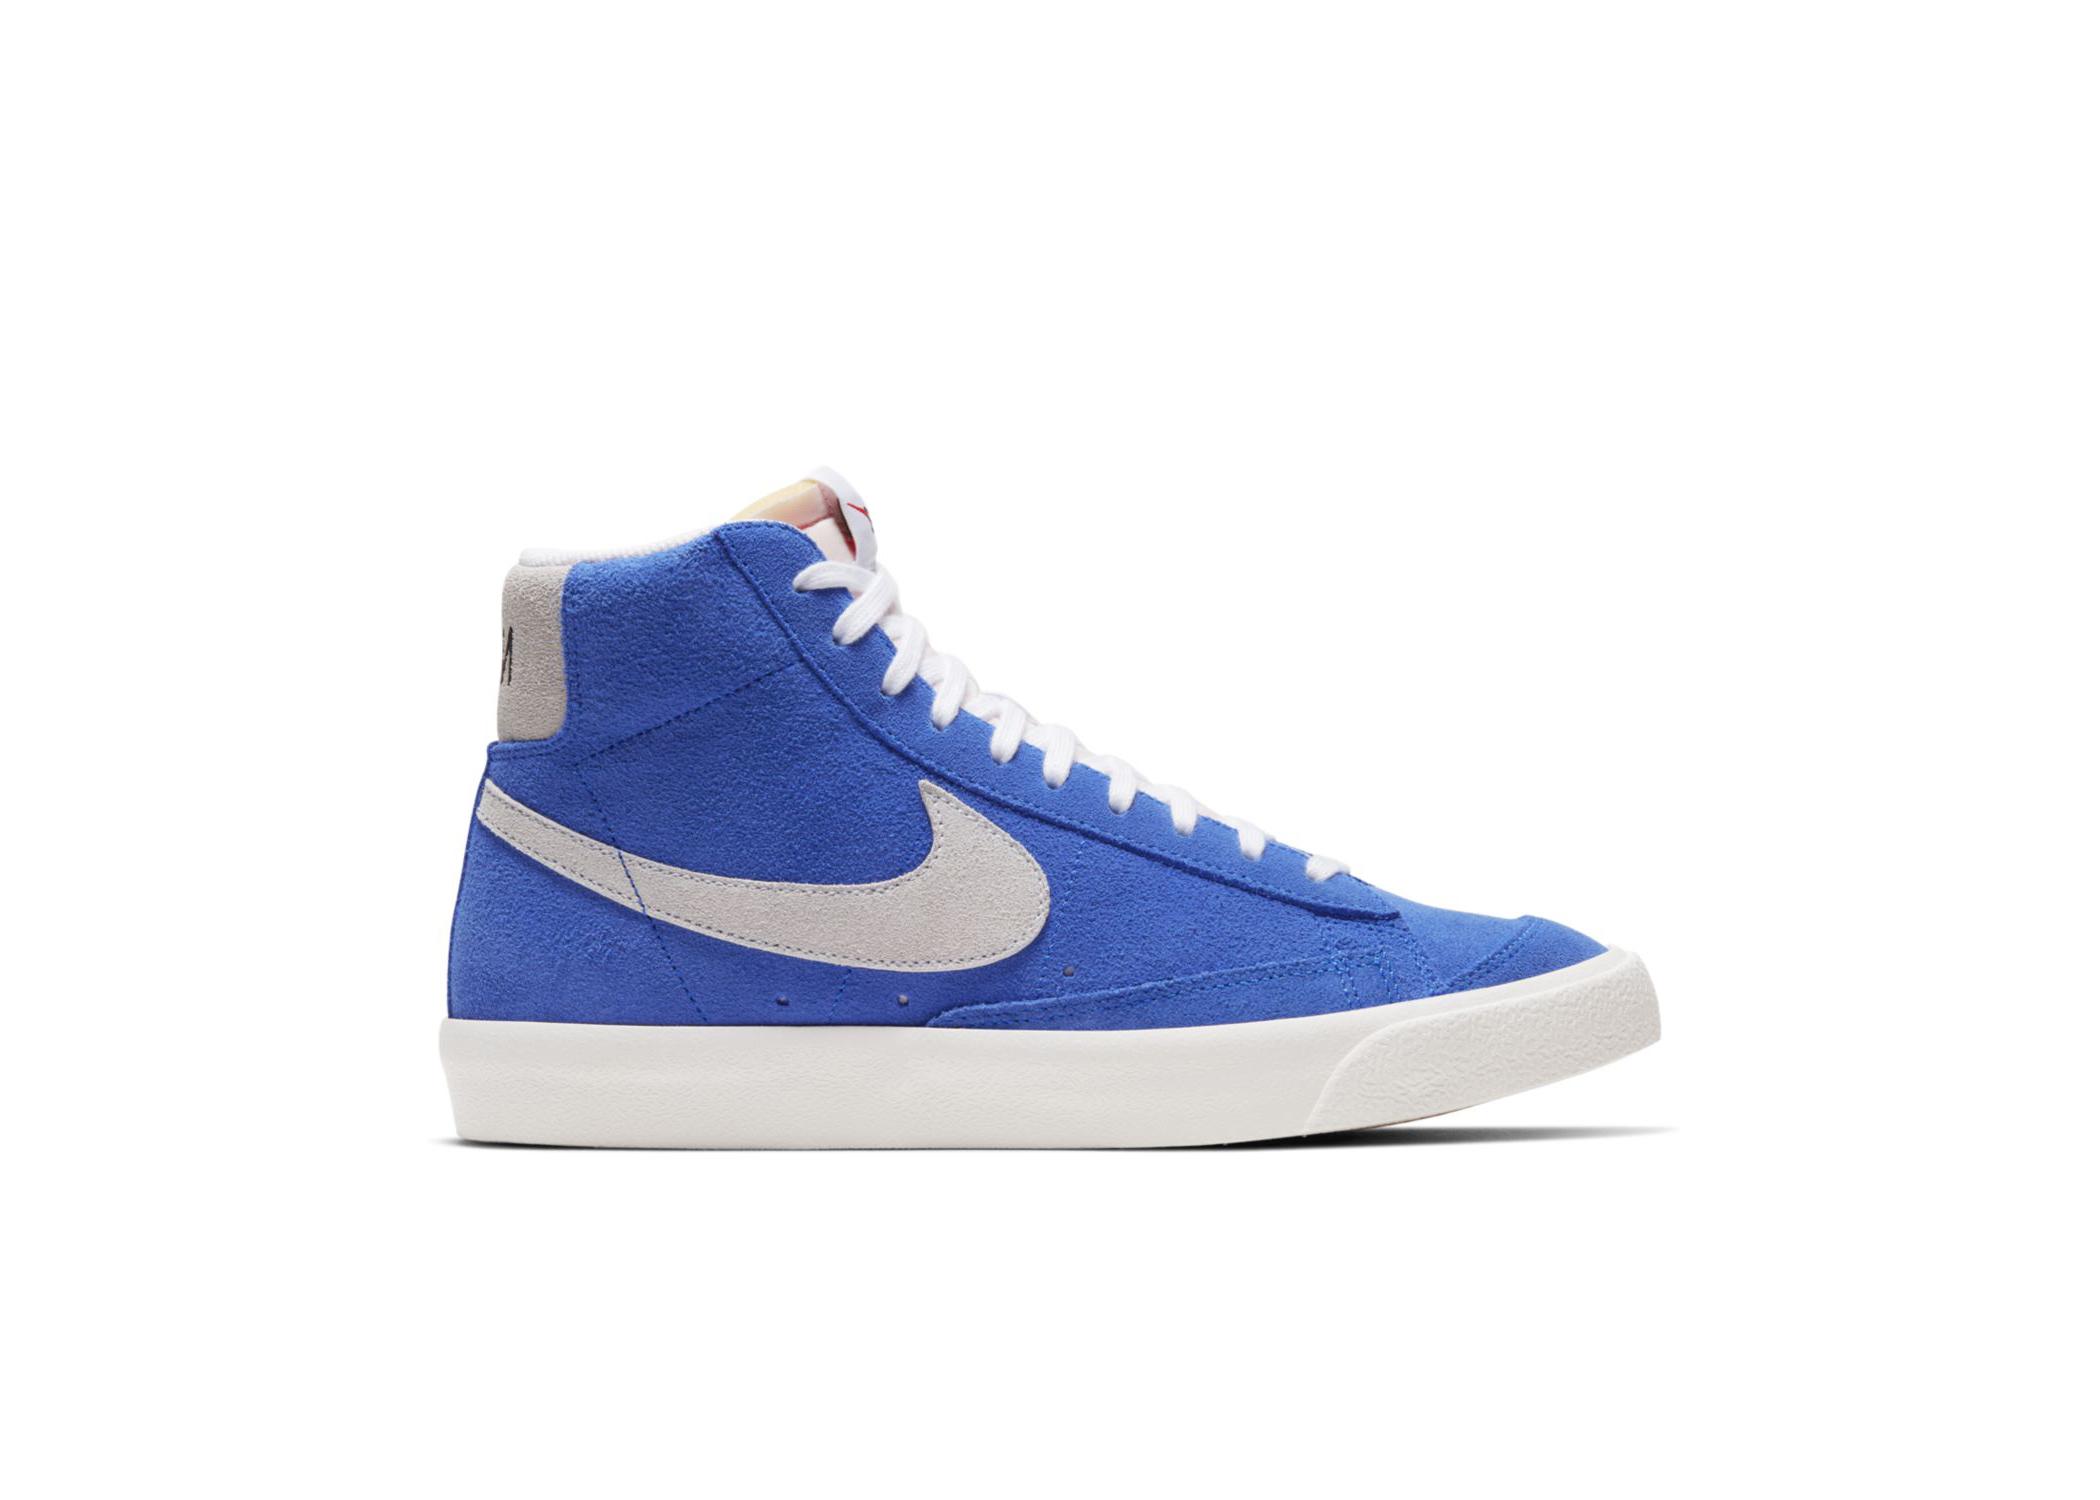 nike blazer blue and white